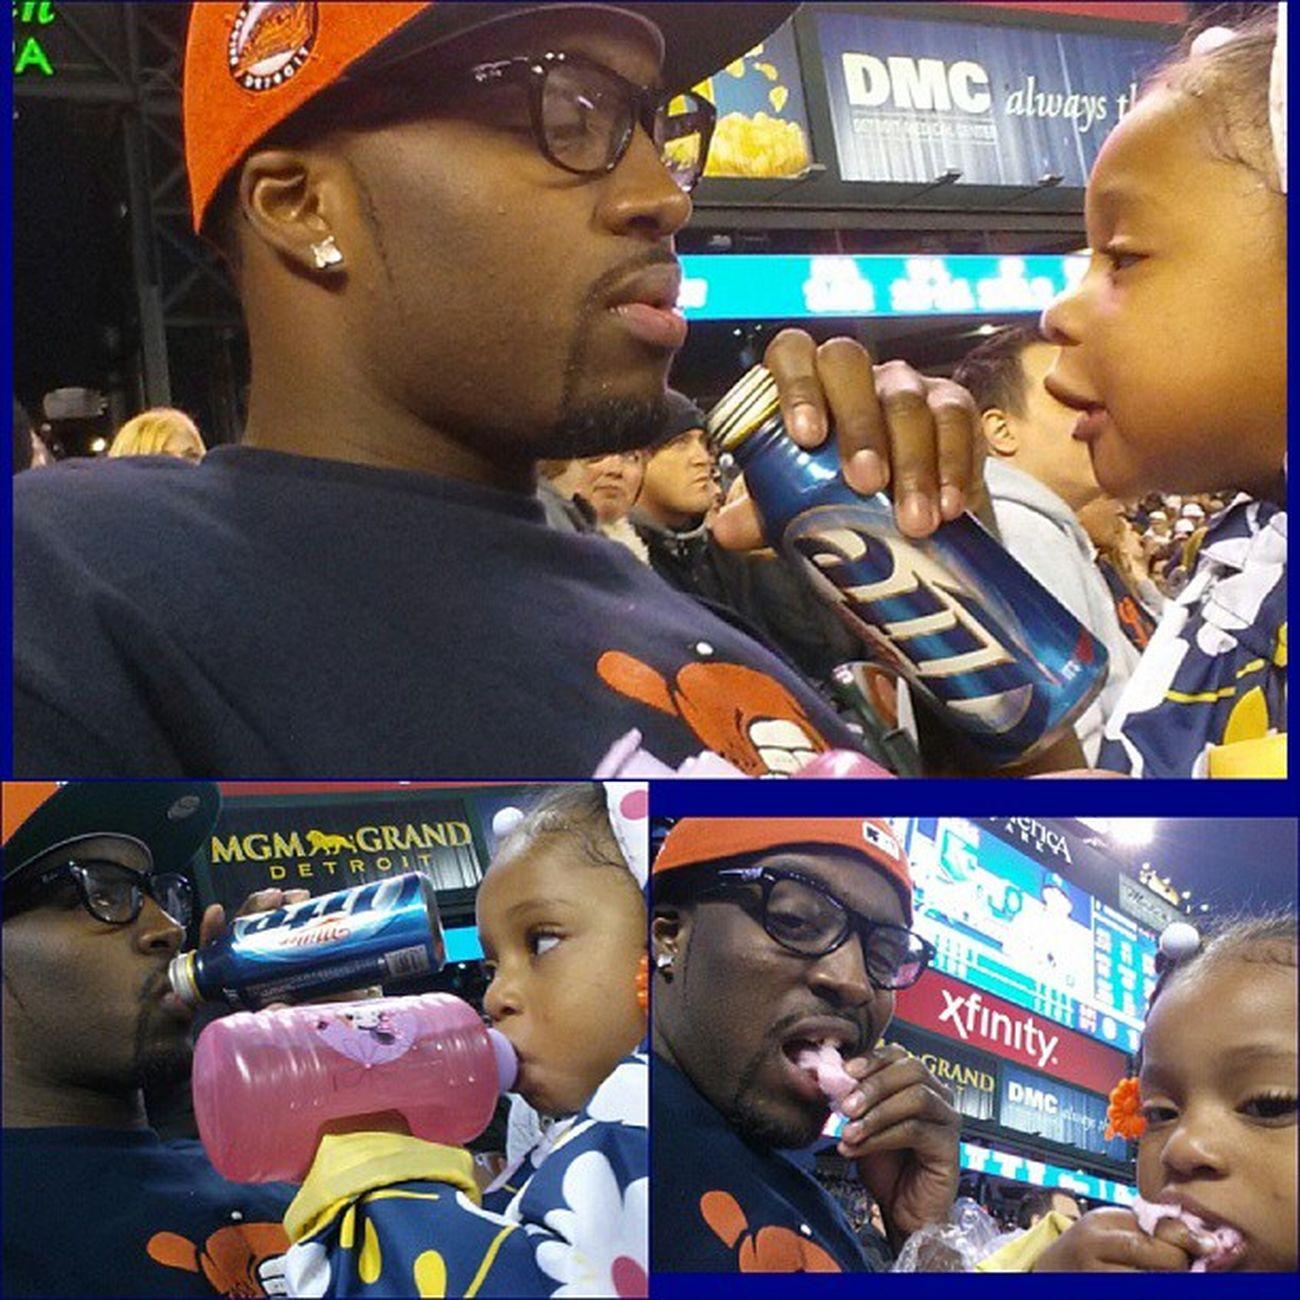 Me & Lil' Ace at the Tiger game a couple weeks ago FamilyFun  Daddydaughtertime WeGetOnEachOthersNerves ButStillLoveEachOther SheAskedForBeer DidntGetIt TeamMartin TeamAce